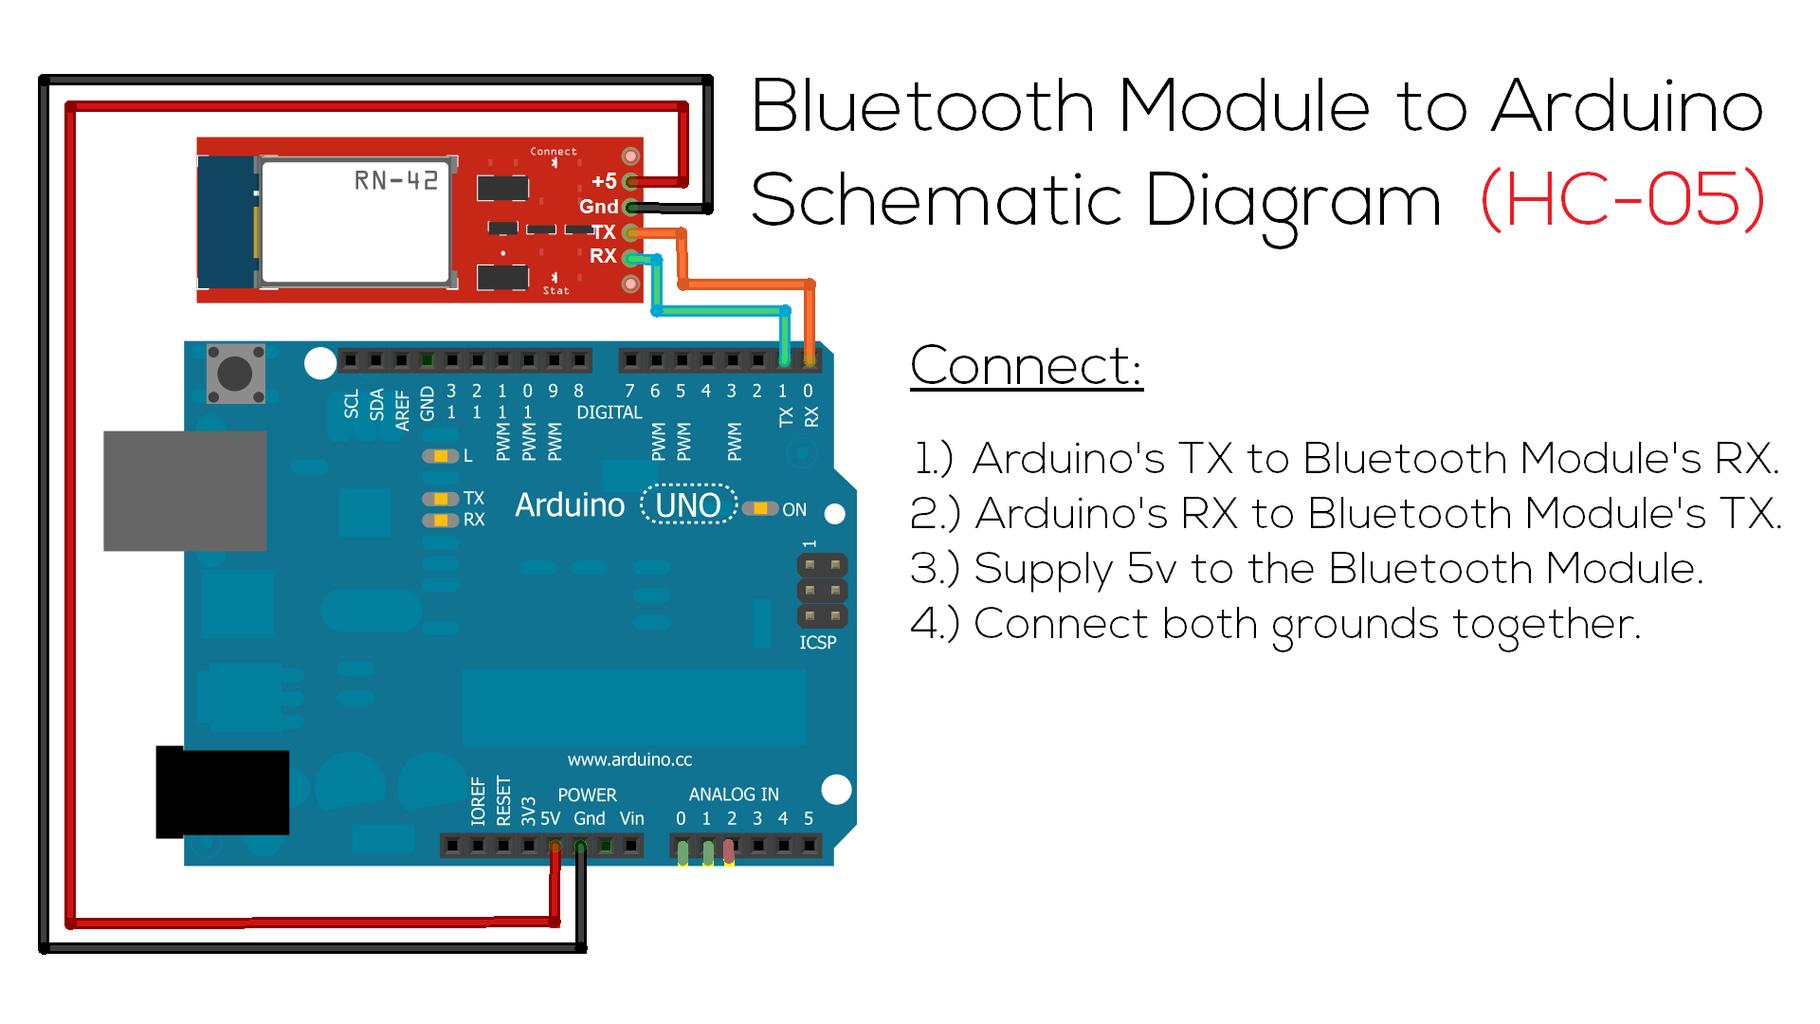 Add the Bluetooth Module